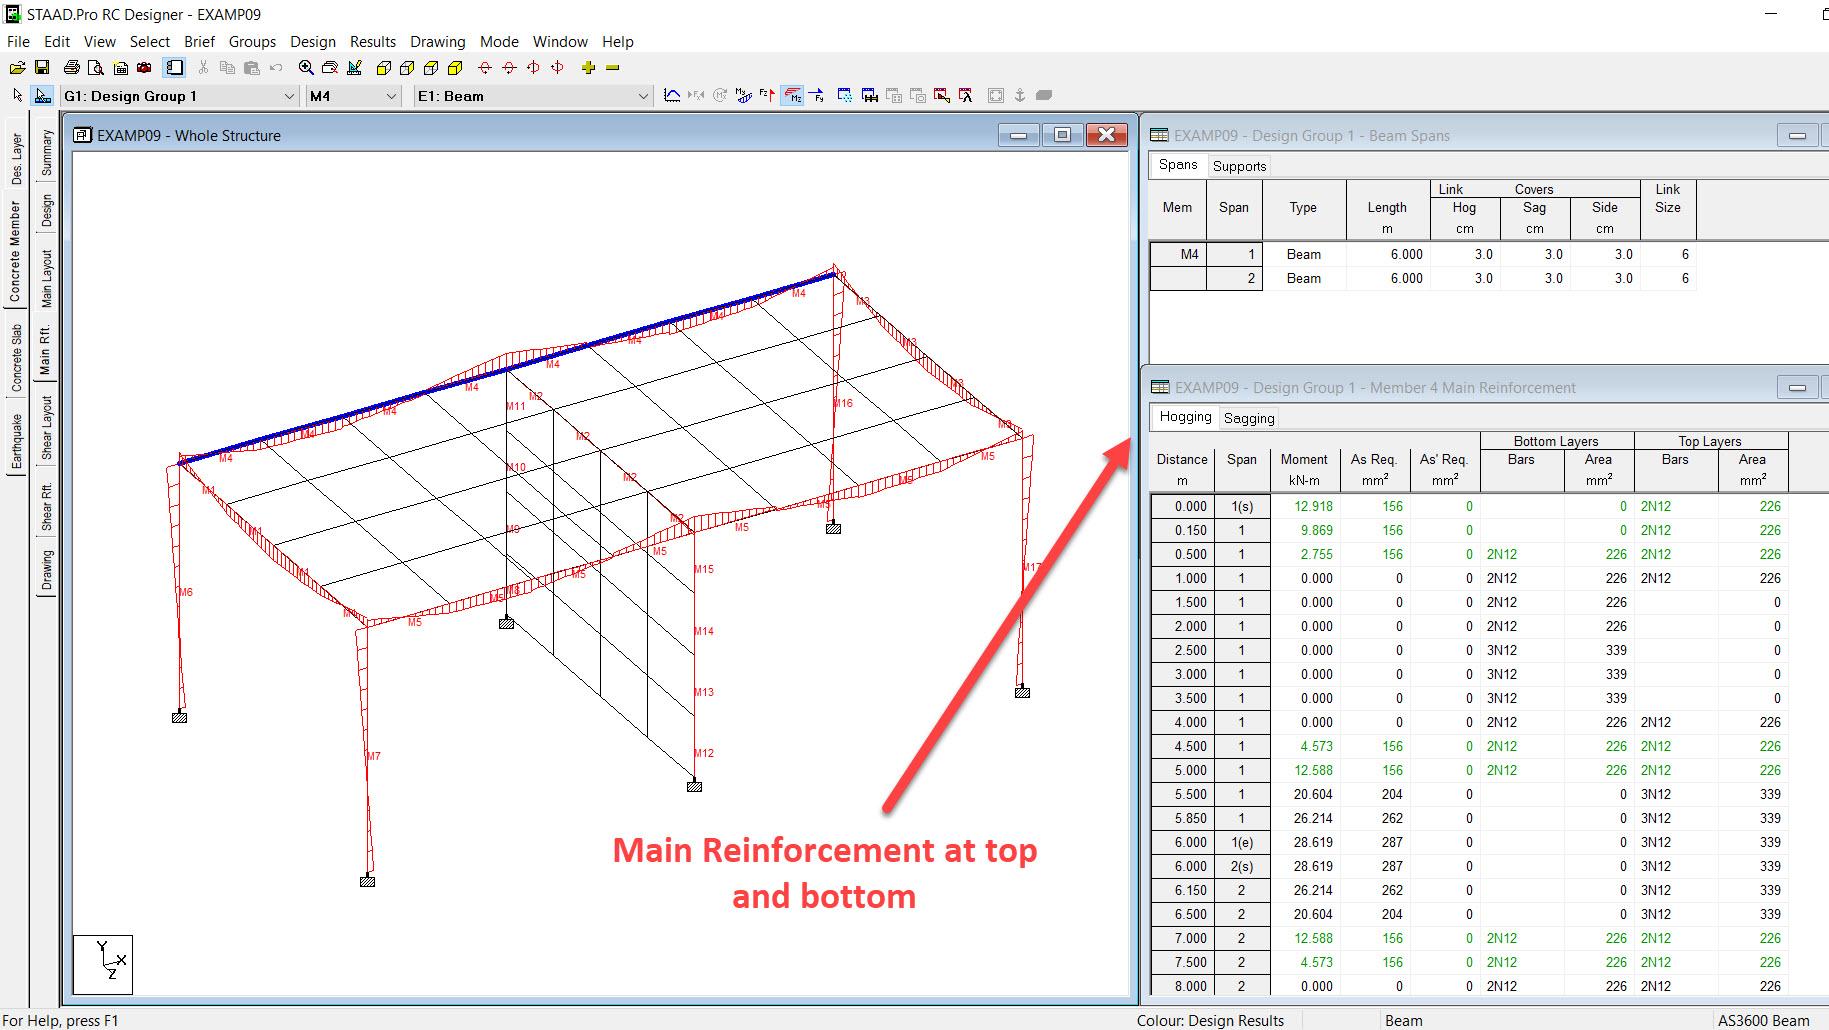 STAAD Pro Beam, Column, Slab detailing -- steel